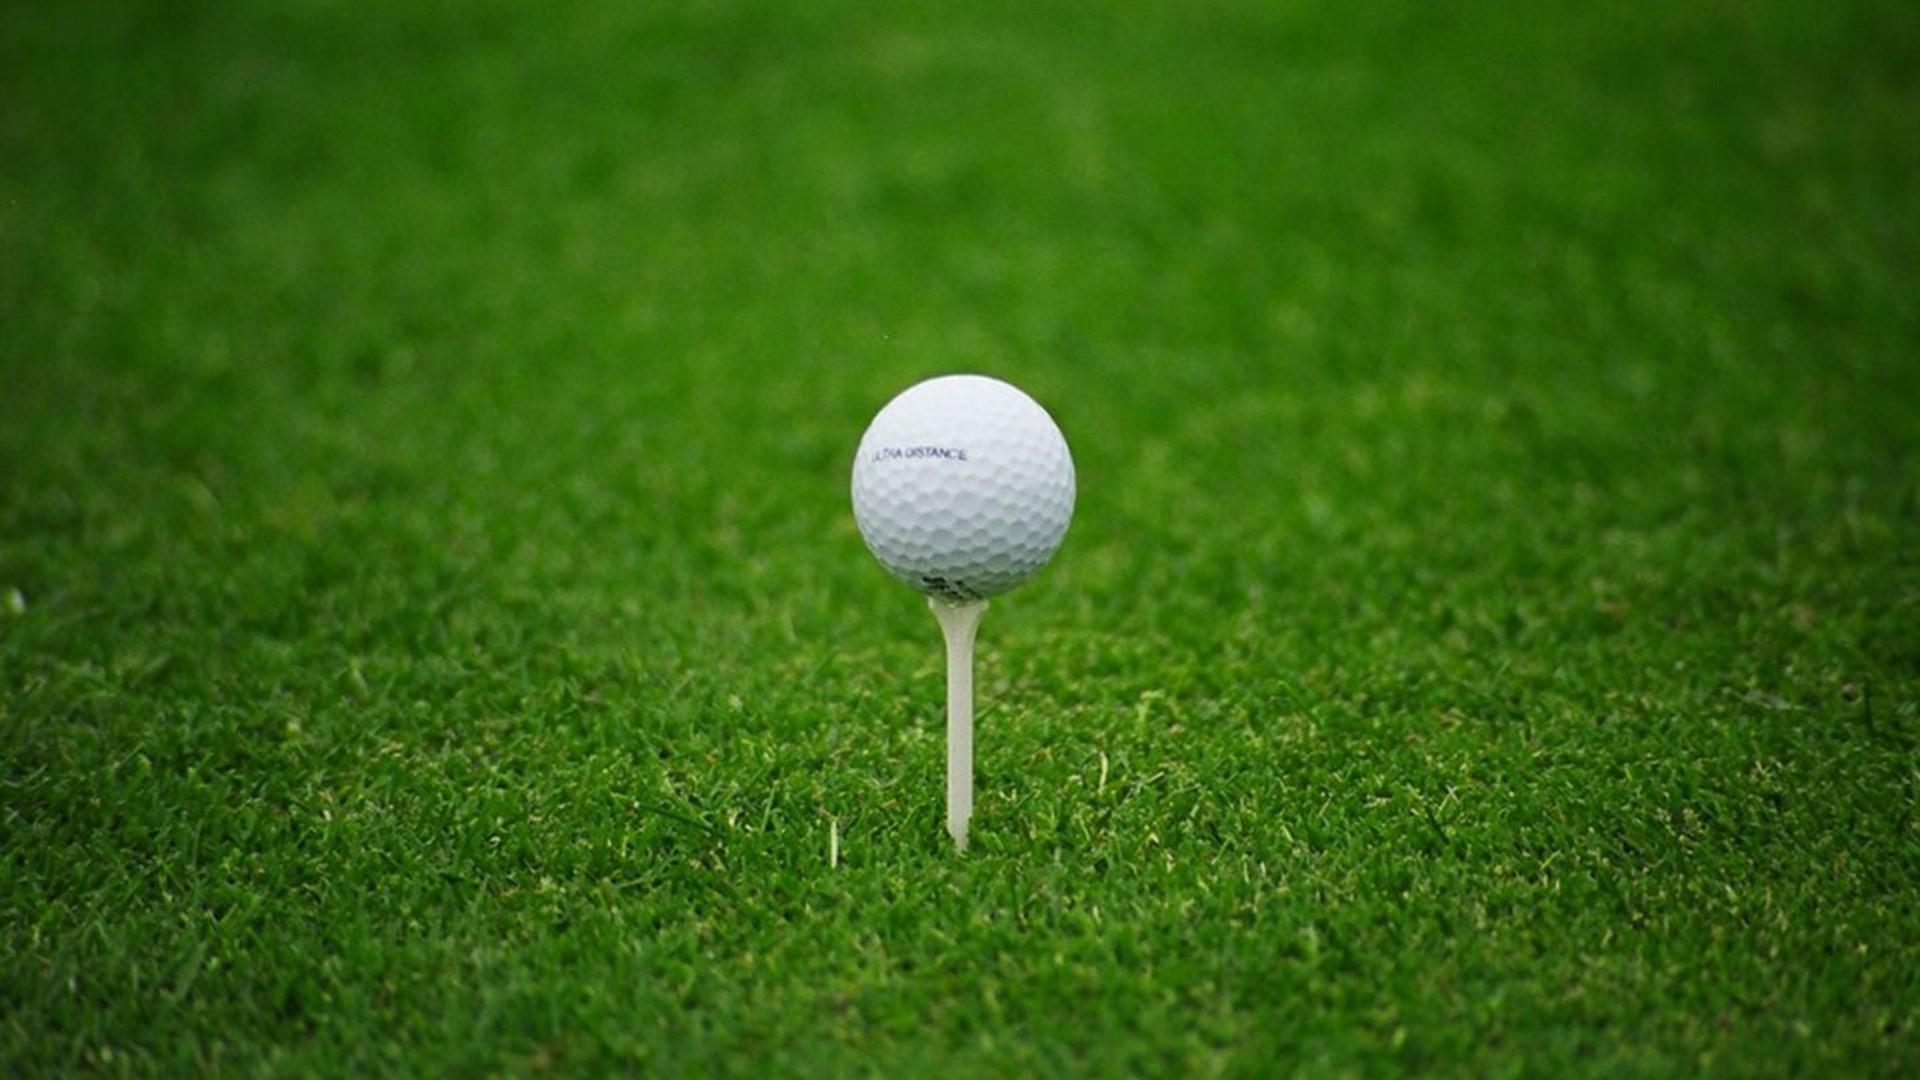 Golf Download Wallpaper